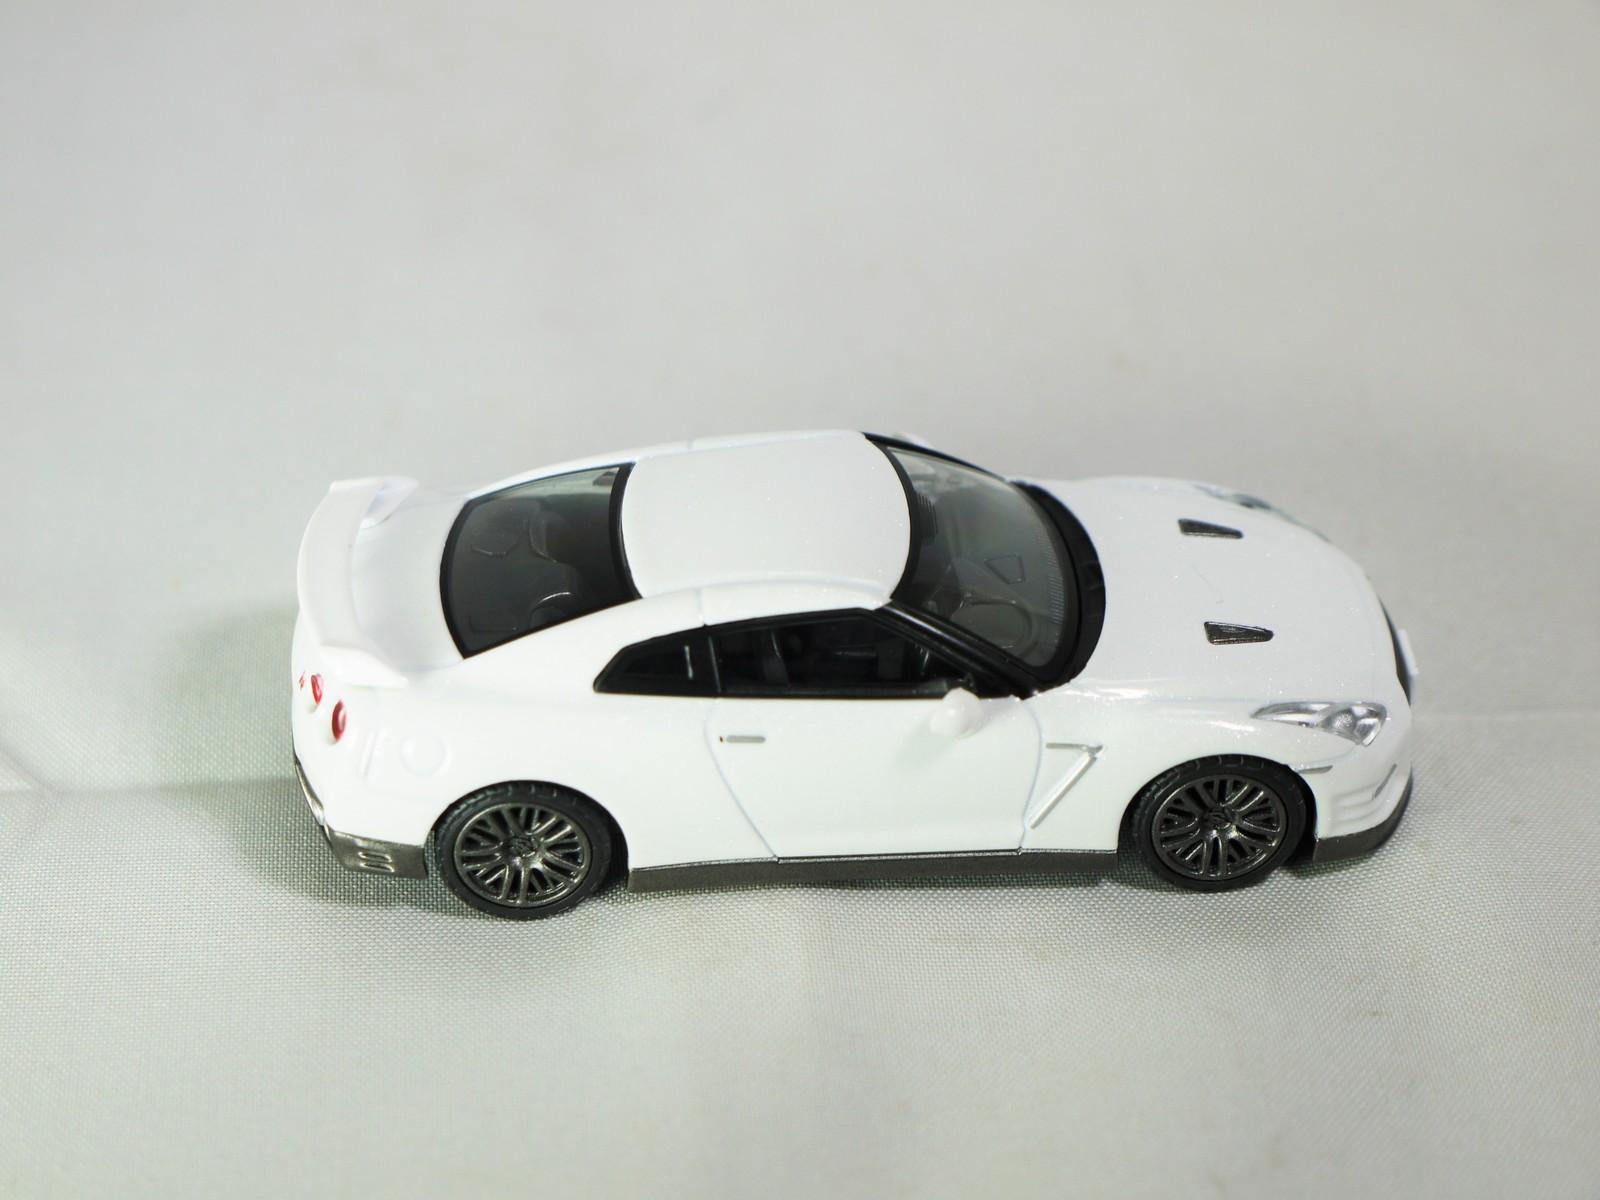 TAKARA TOMY TOMICA LIMITED TOMYTEC NISSAN GT-R Premium Edition LV-N116b White